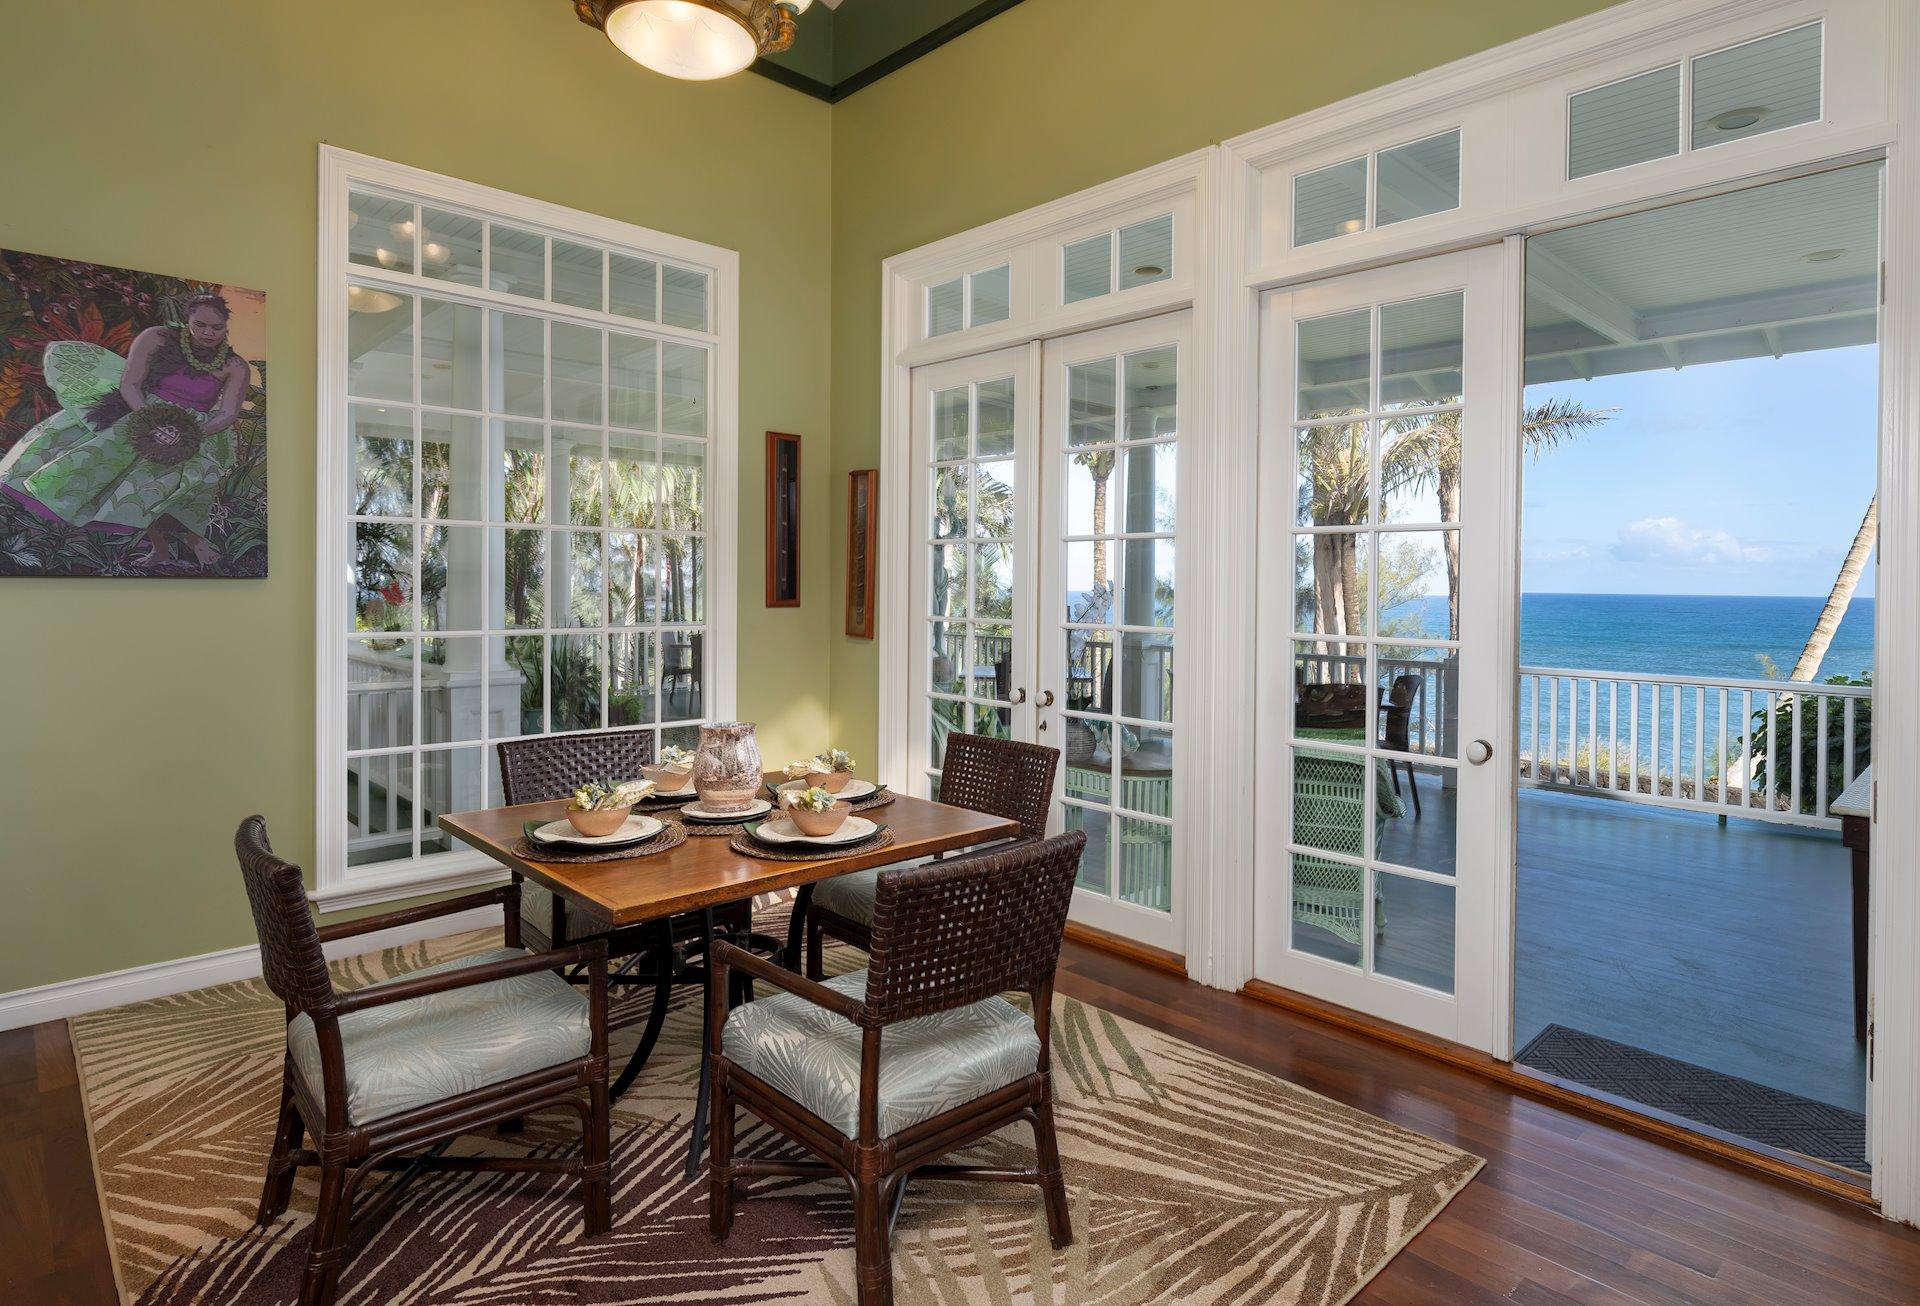 Breakfast nook off the kitchen leads to a huge veranda.